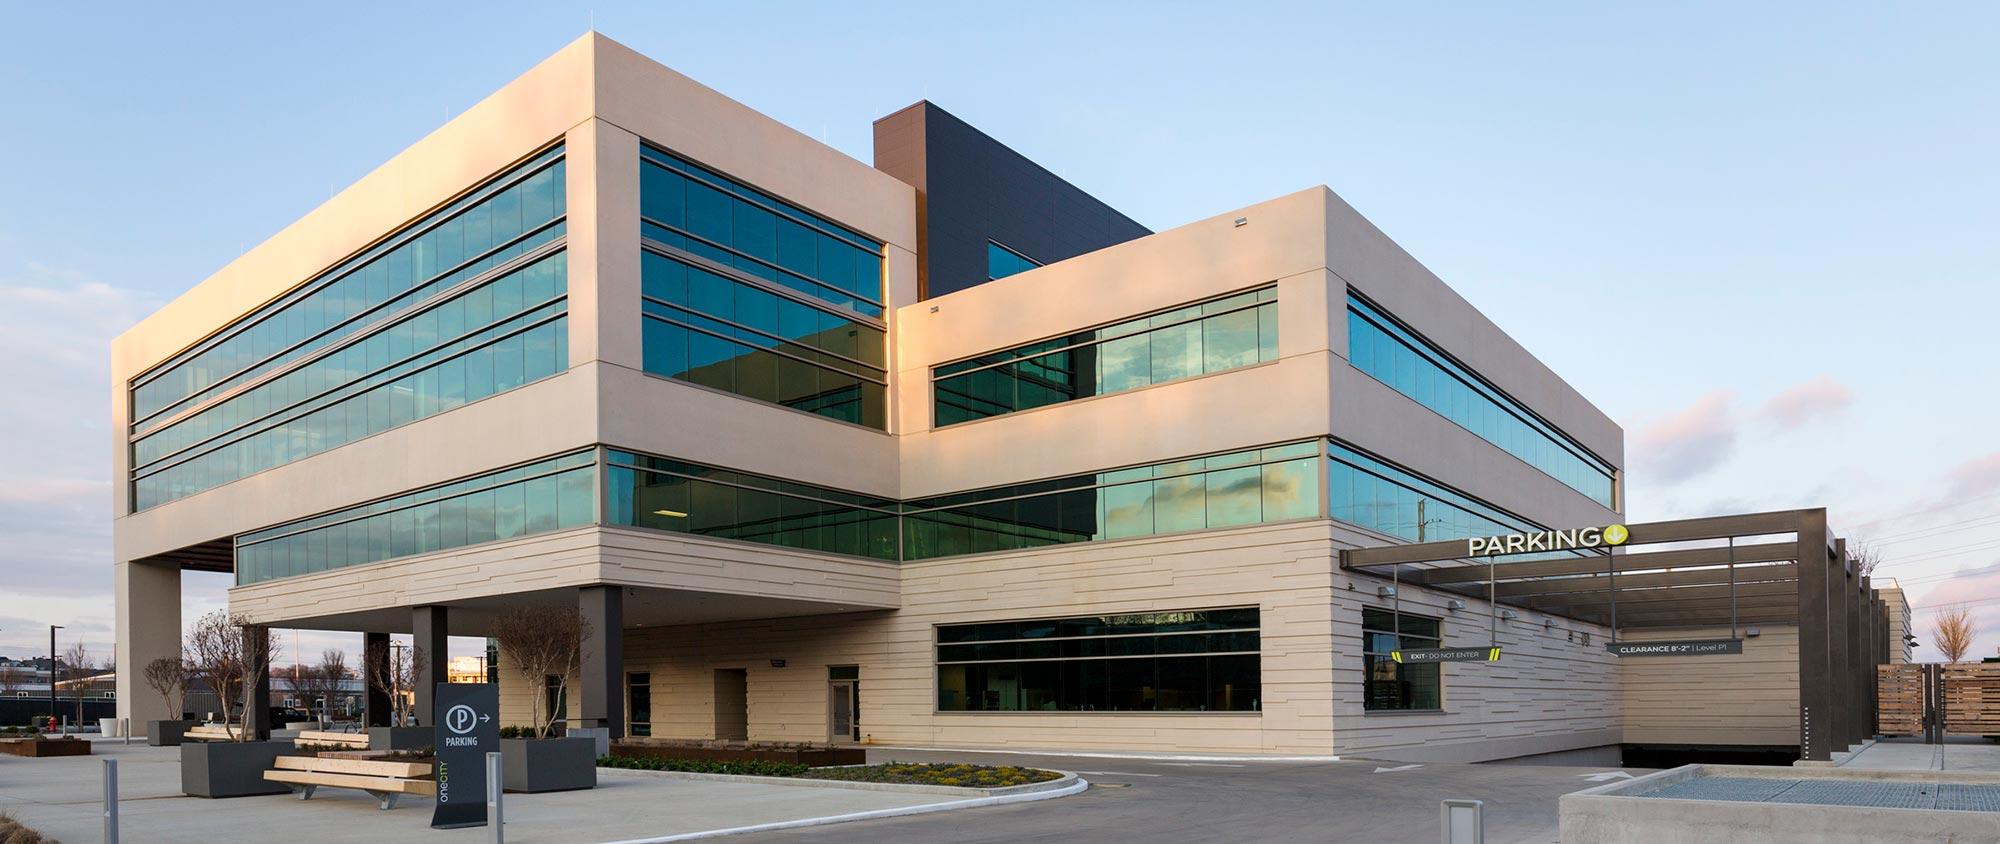 8 C1TY BLVD Medical Office Building